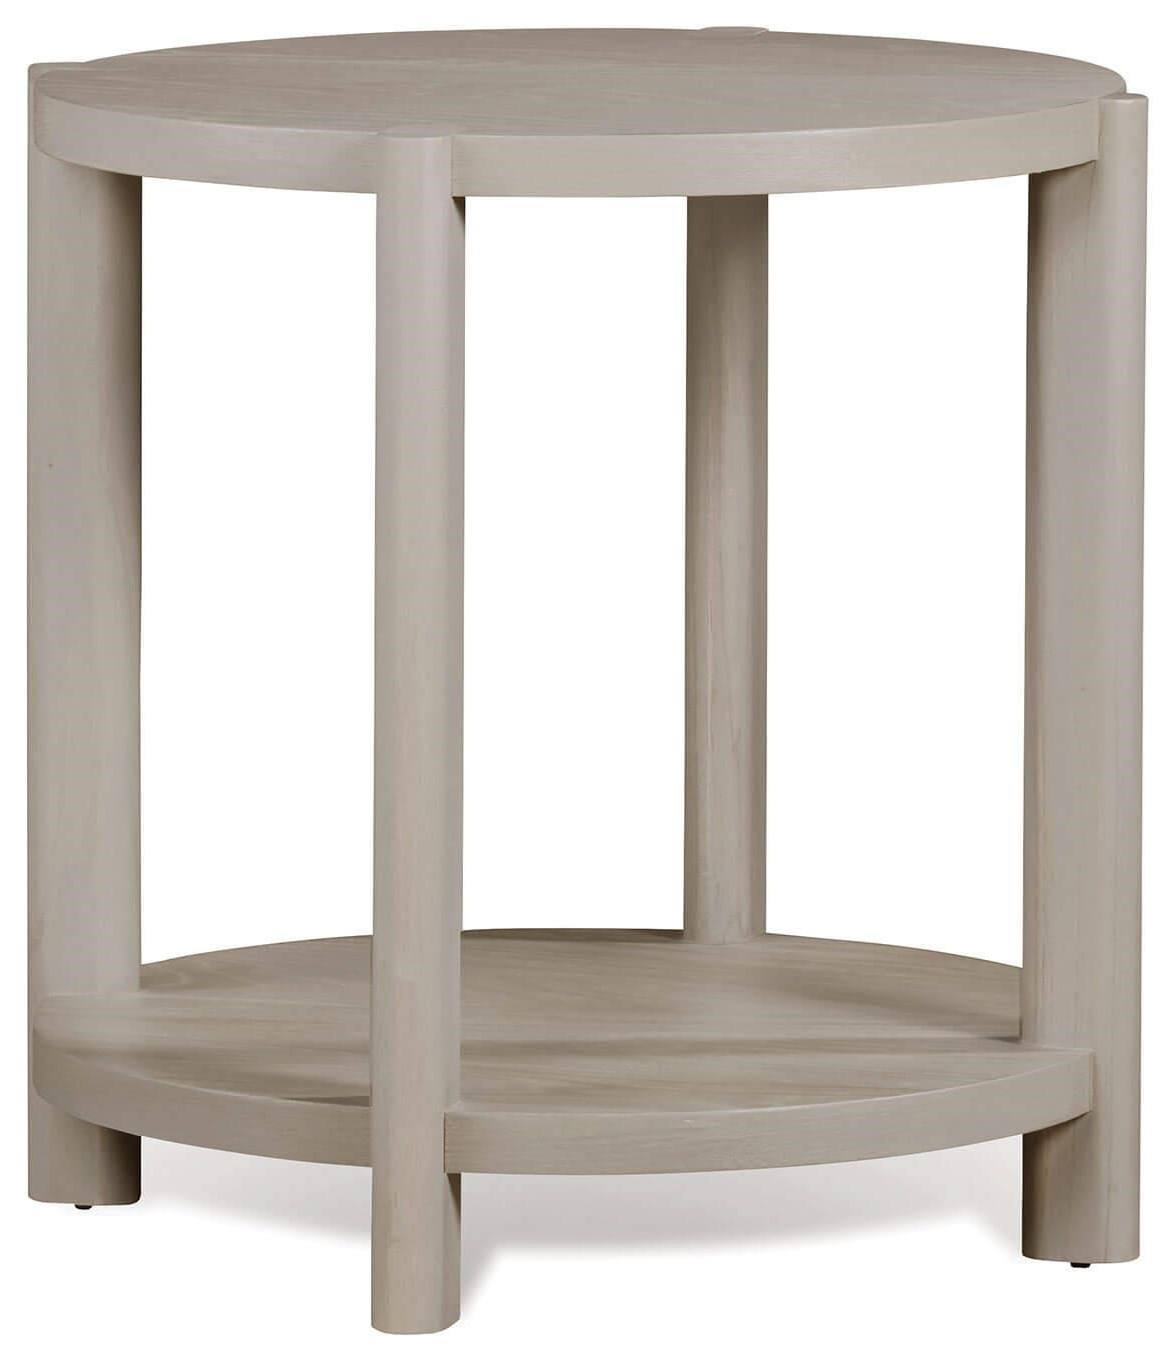 Sarah Richardson Vista Vista Round End Table by Palliser at Stoney Creek Furniture